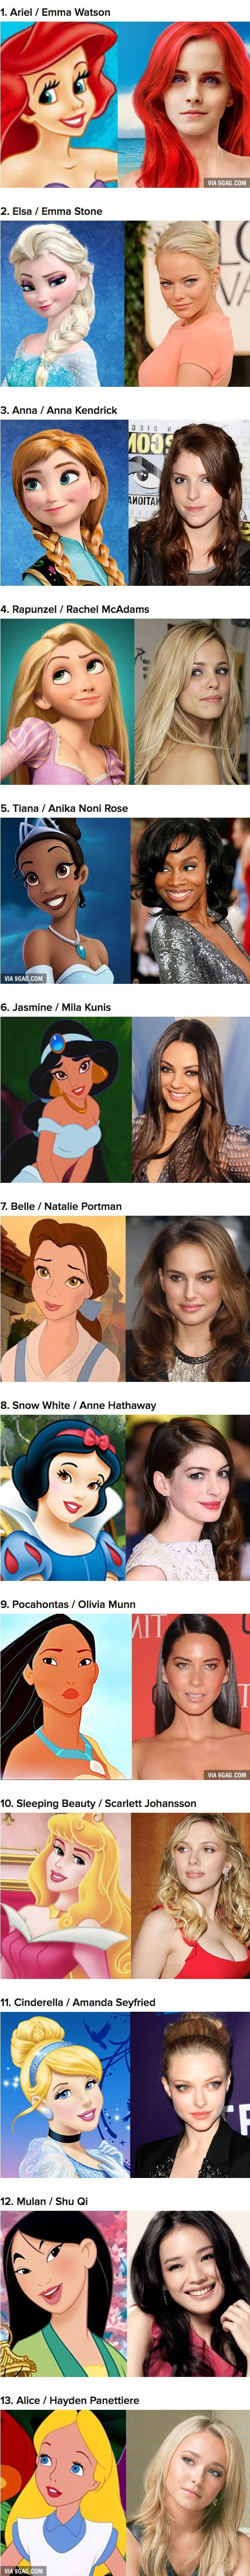 13 Perfectly Cast Disney Princesses?